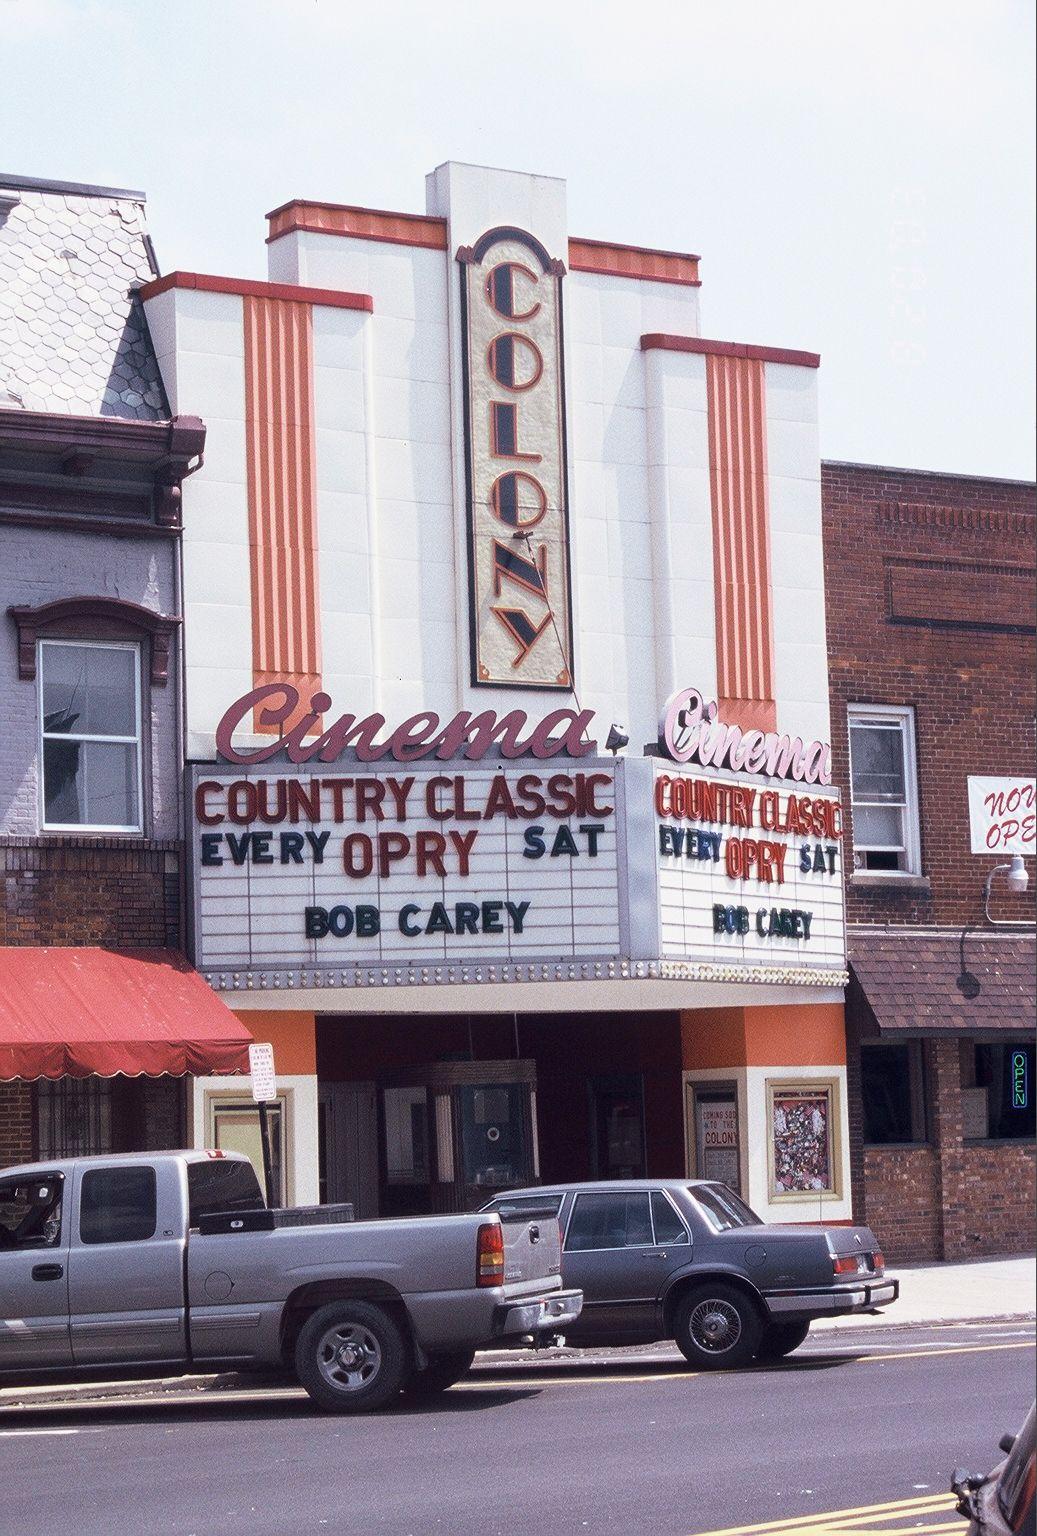 The Colony Cinema in Hillsboro, Ohio. Where John and I had